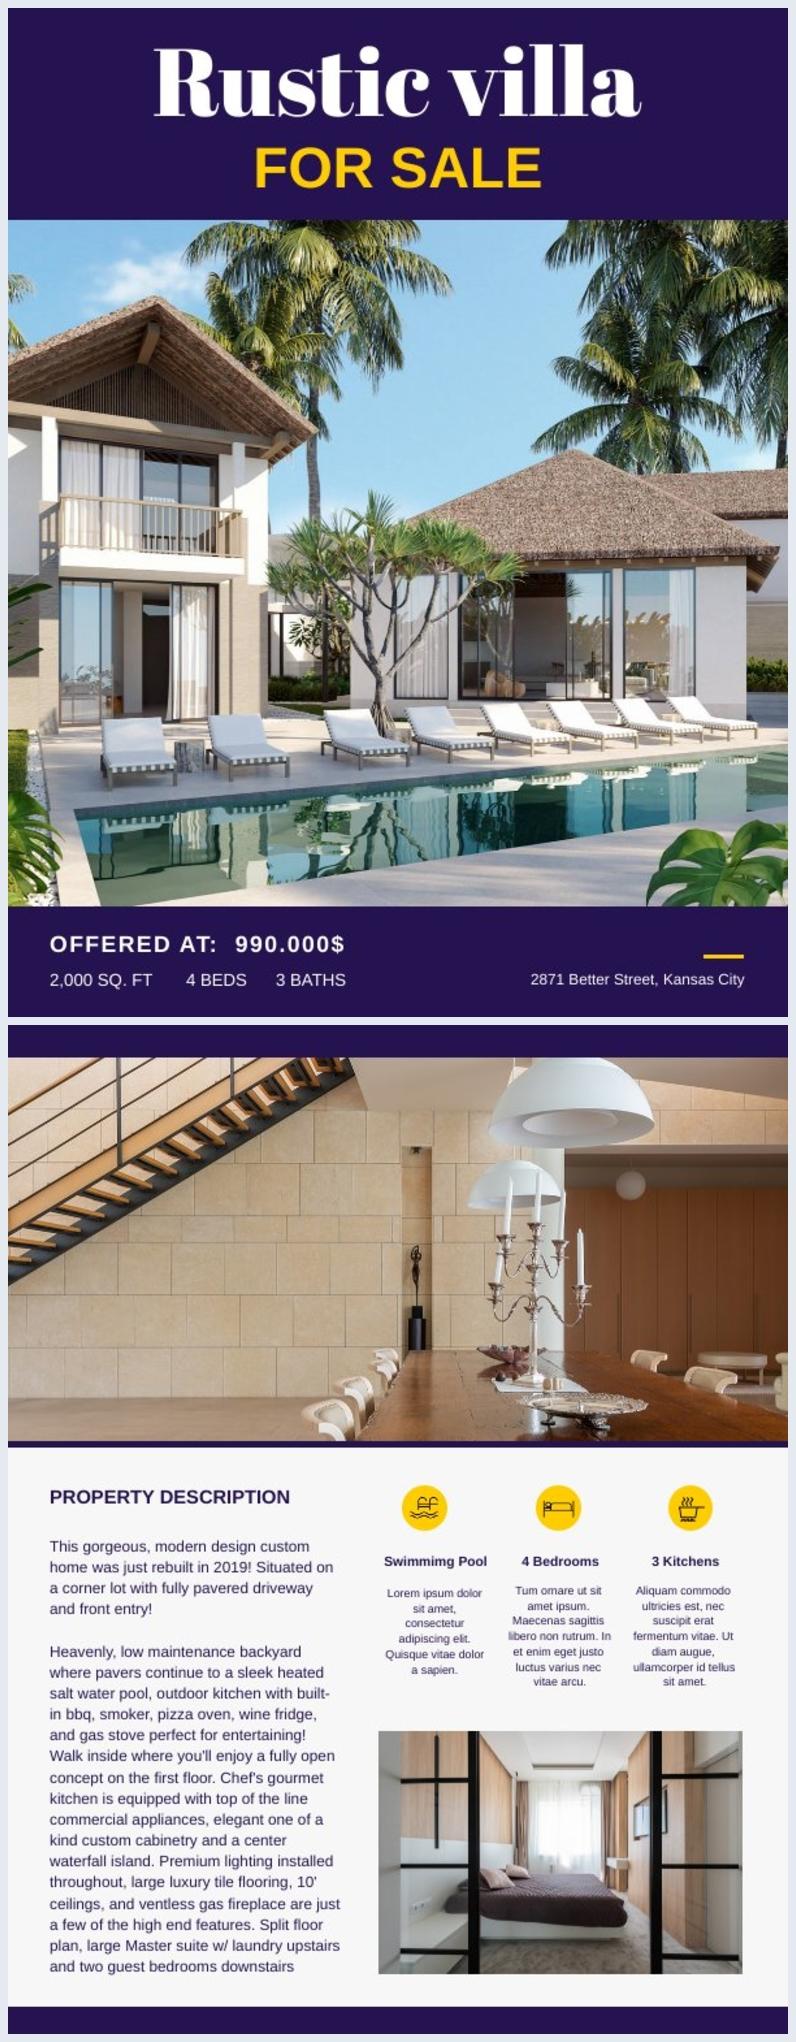 For Sale Real Estate Flyer Design Example